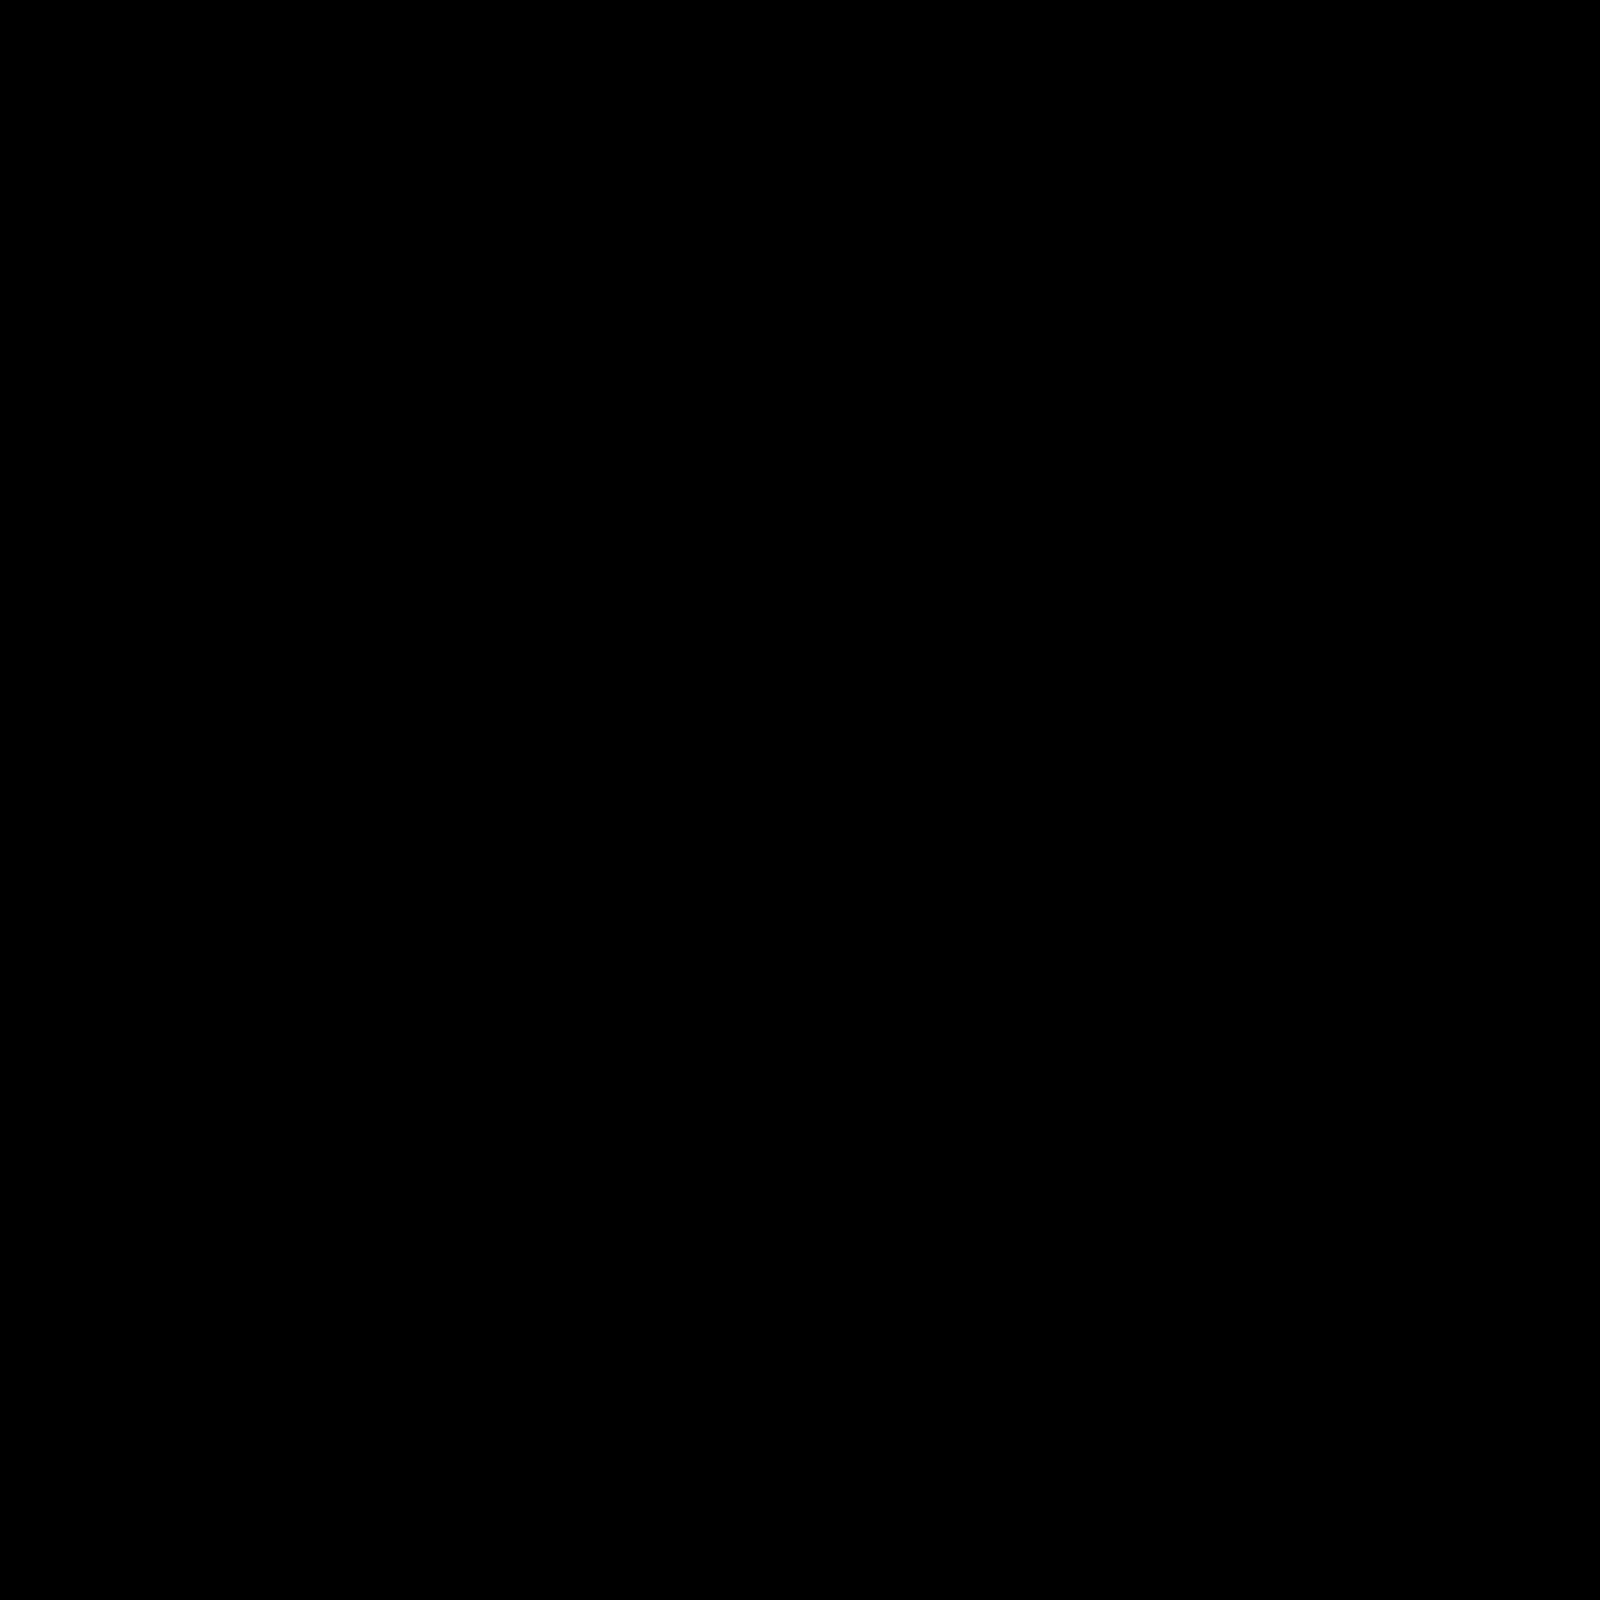 Bath Light icon